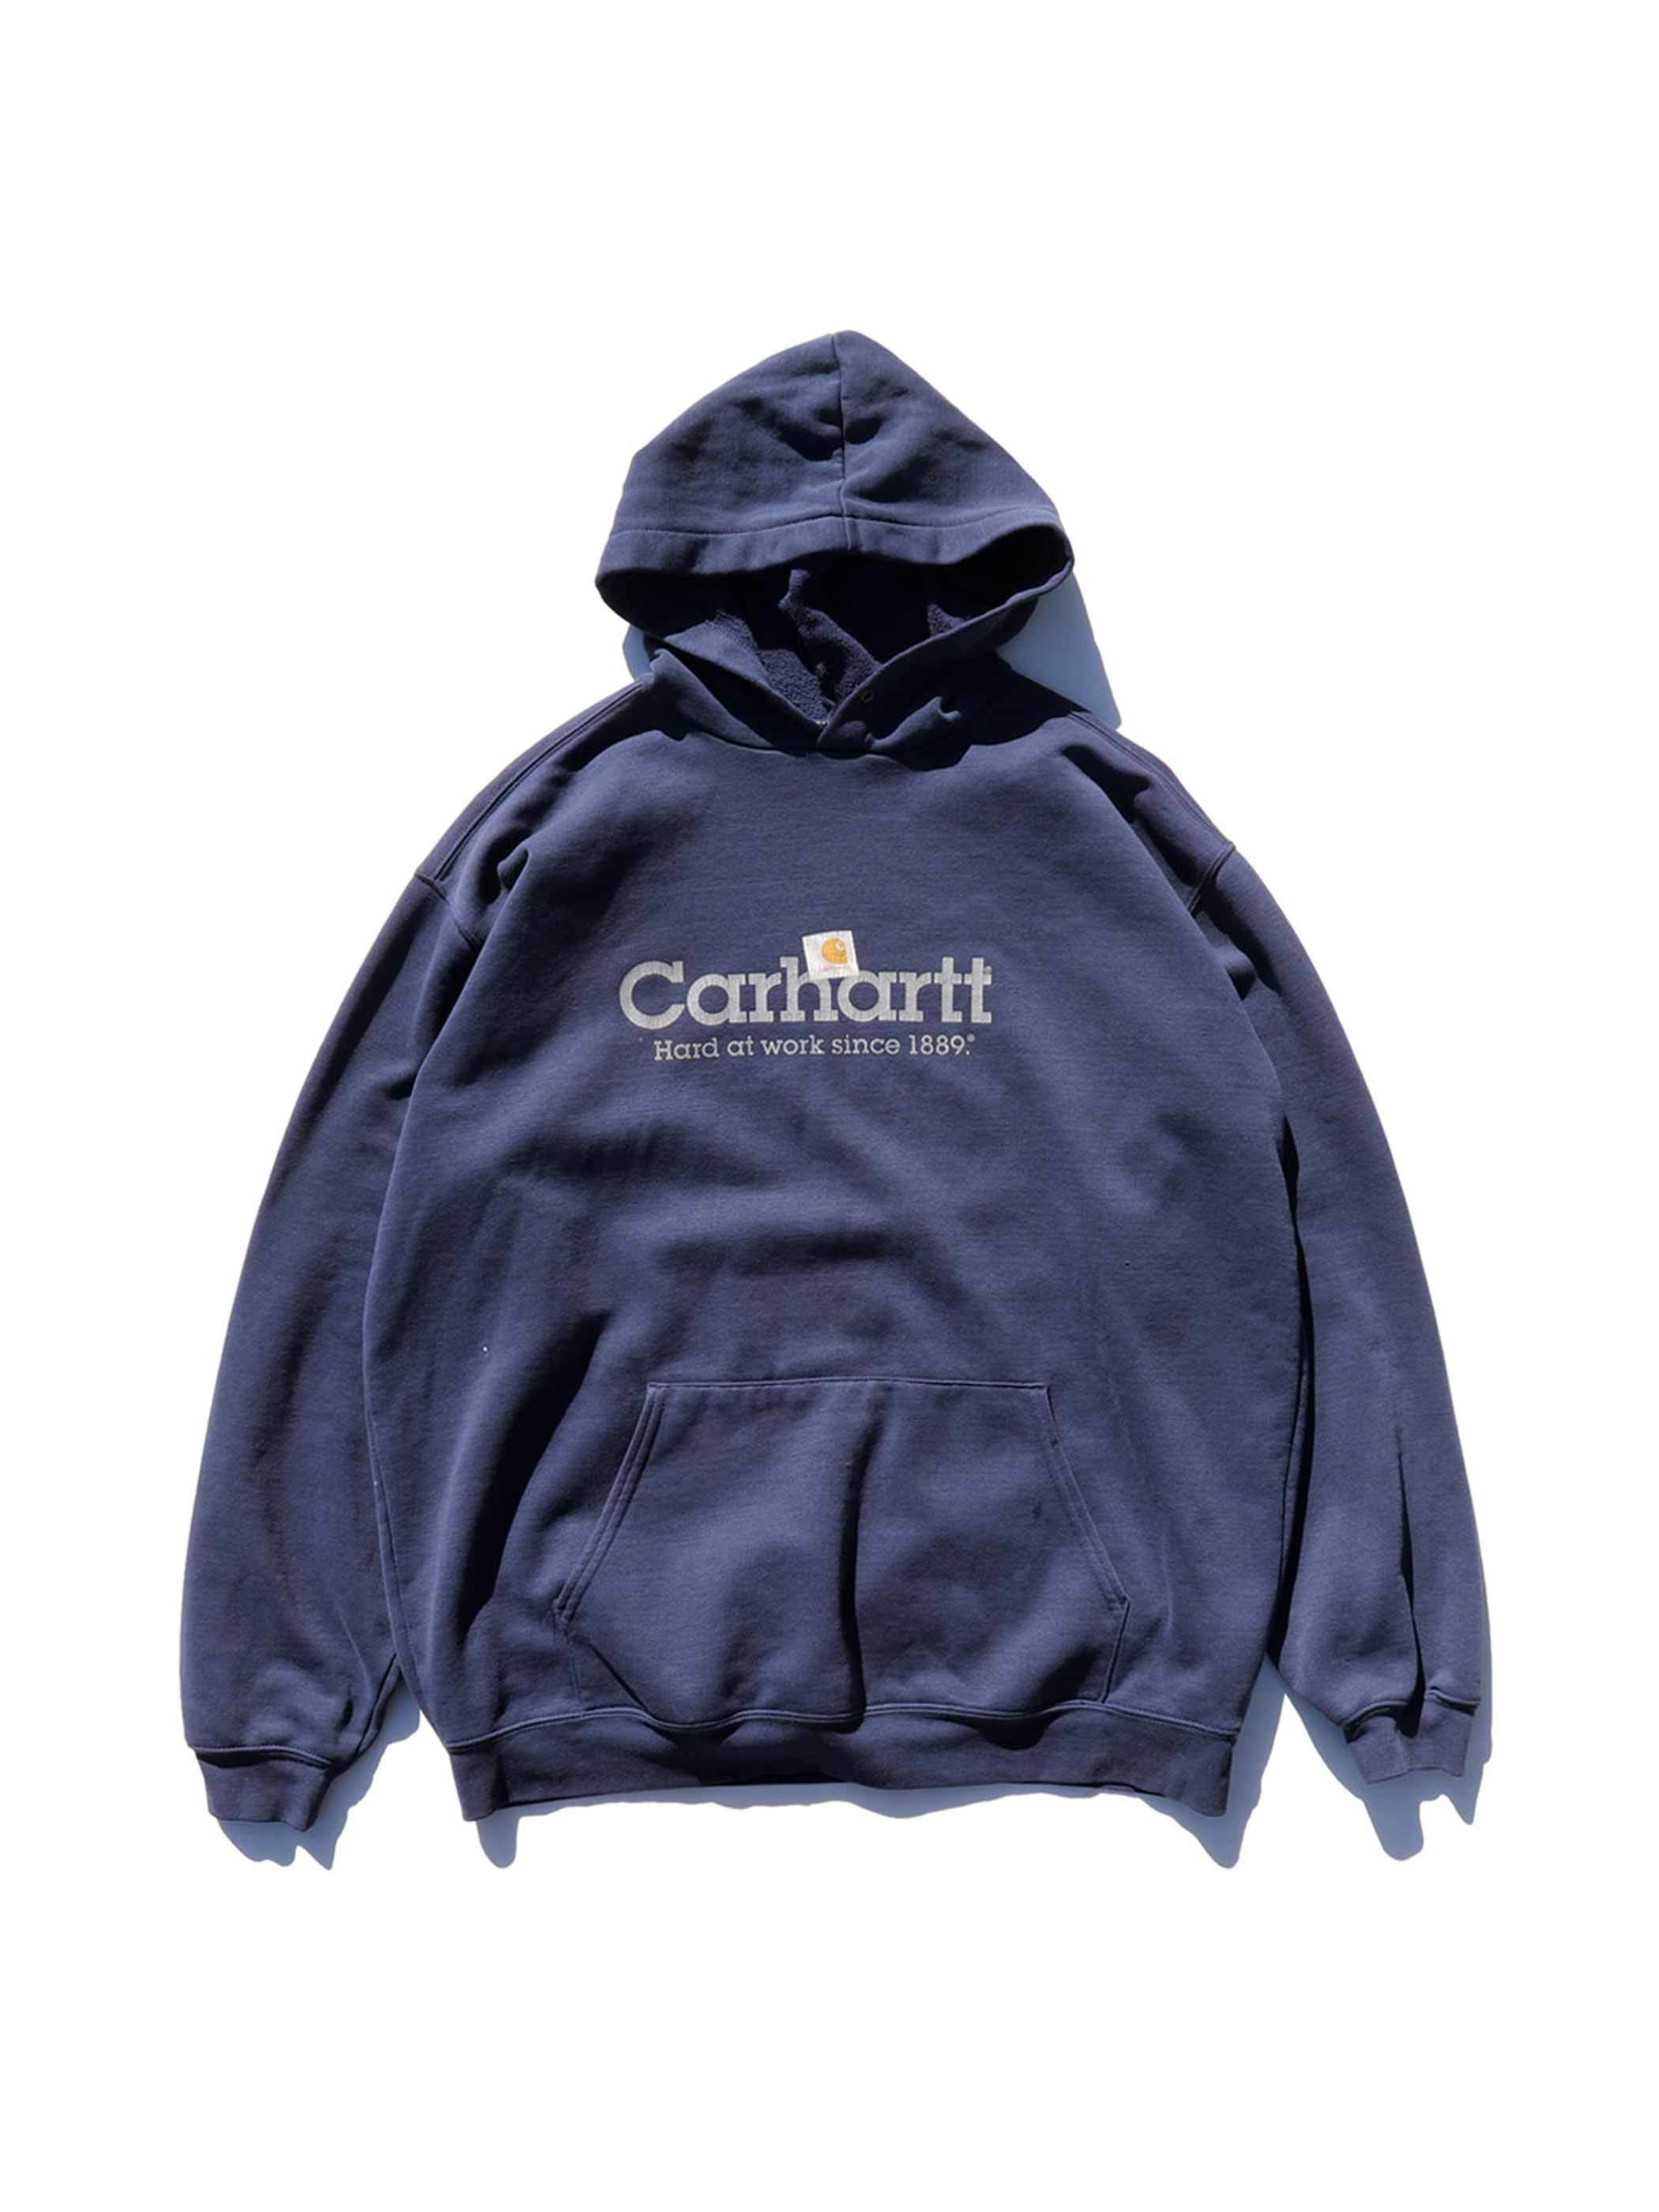 00's CARHARTT プルオーバーパーカー [XL]